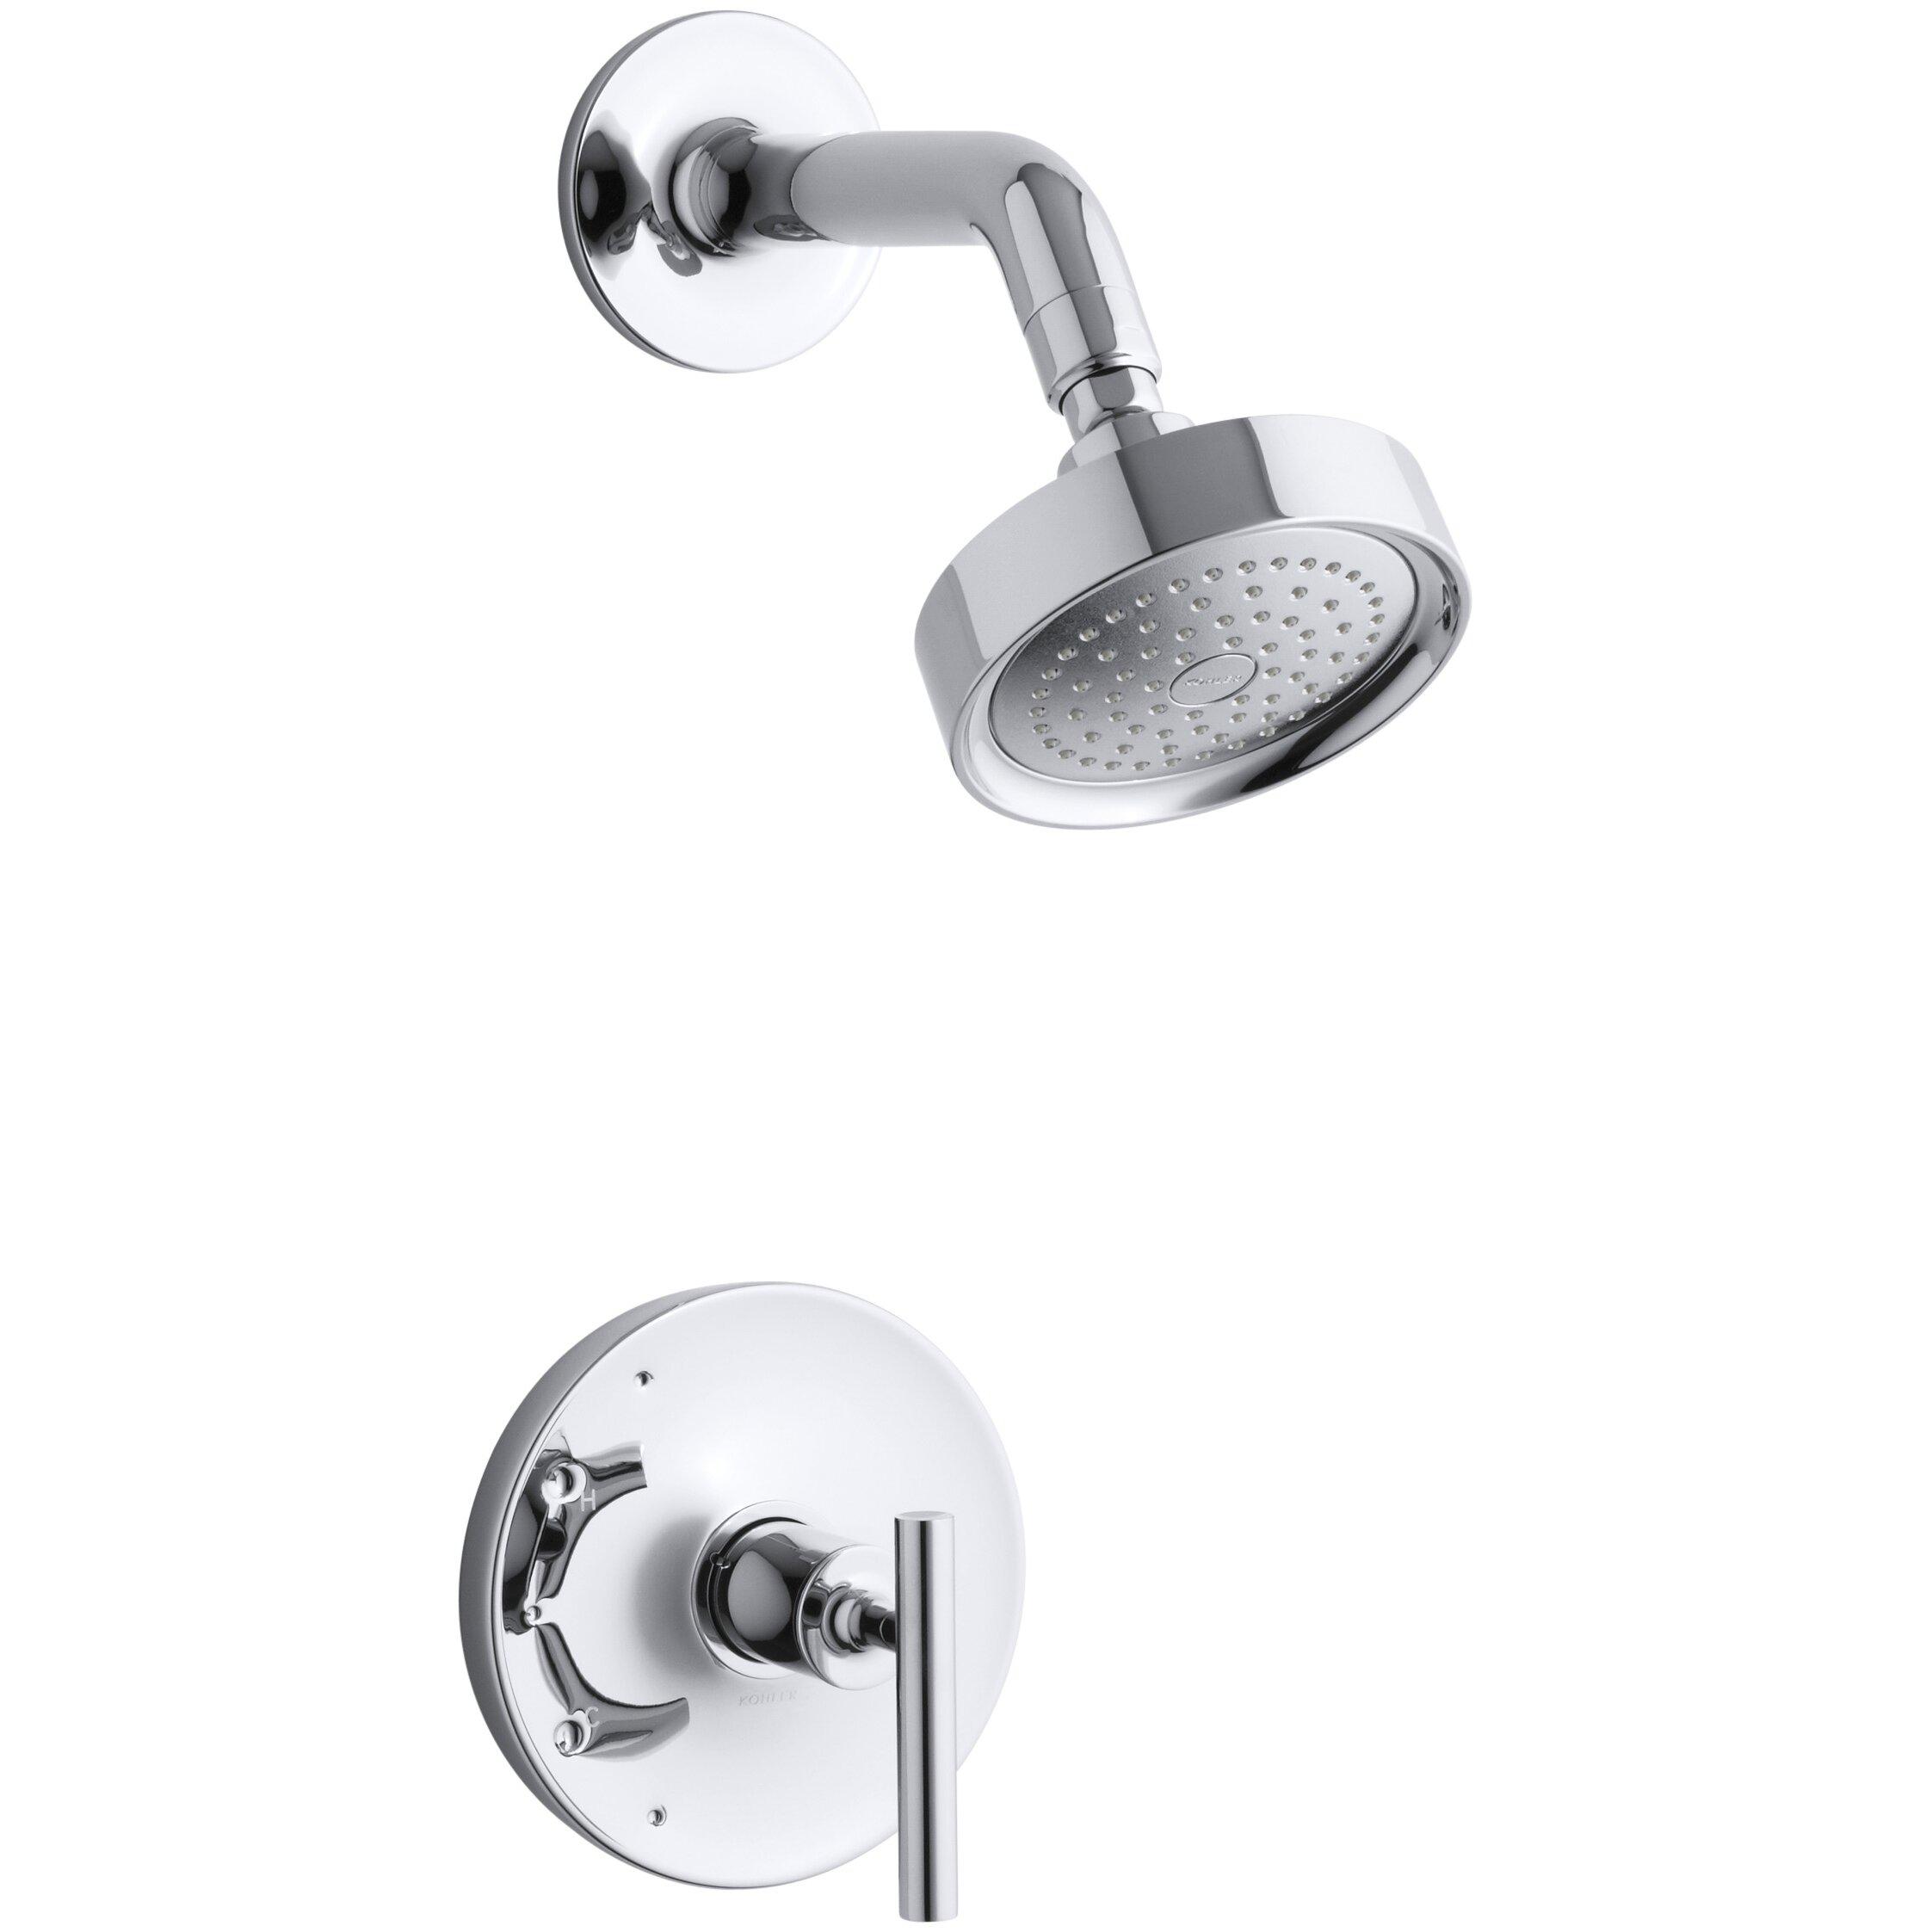 kohler purist rite temp pressure balancing shower faucet trim kohler purist rite temp pressure balancing shower faucet trim lever handle valve